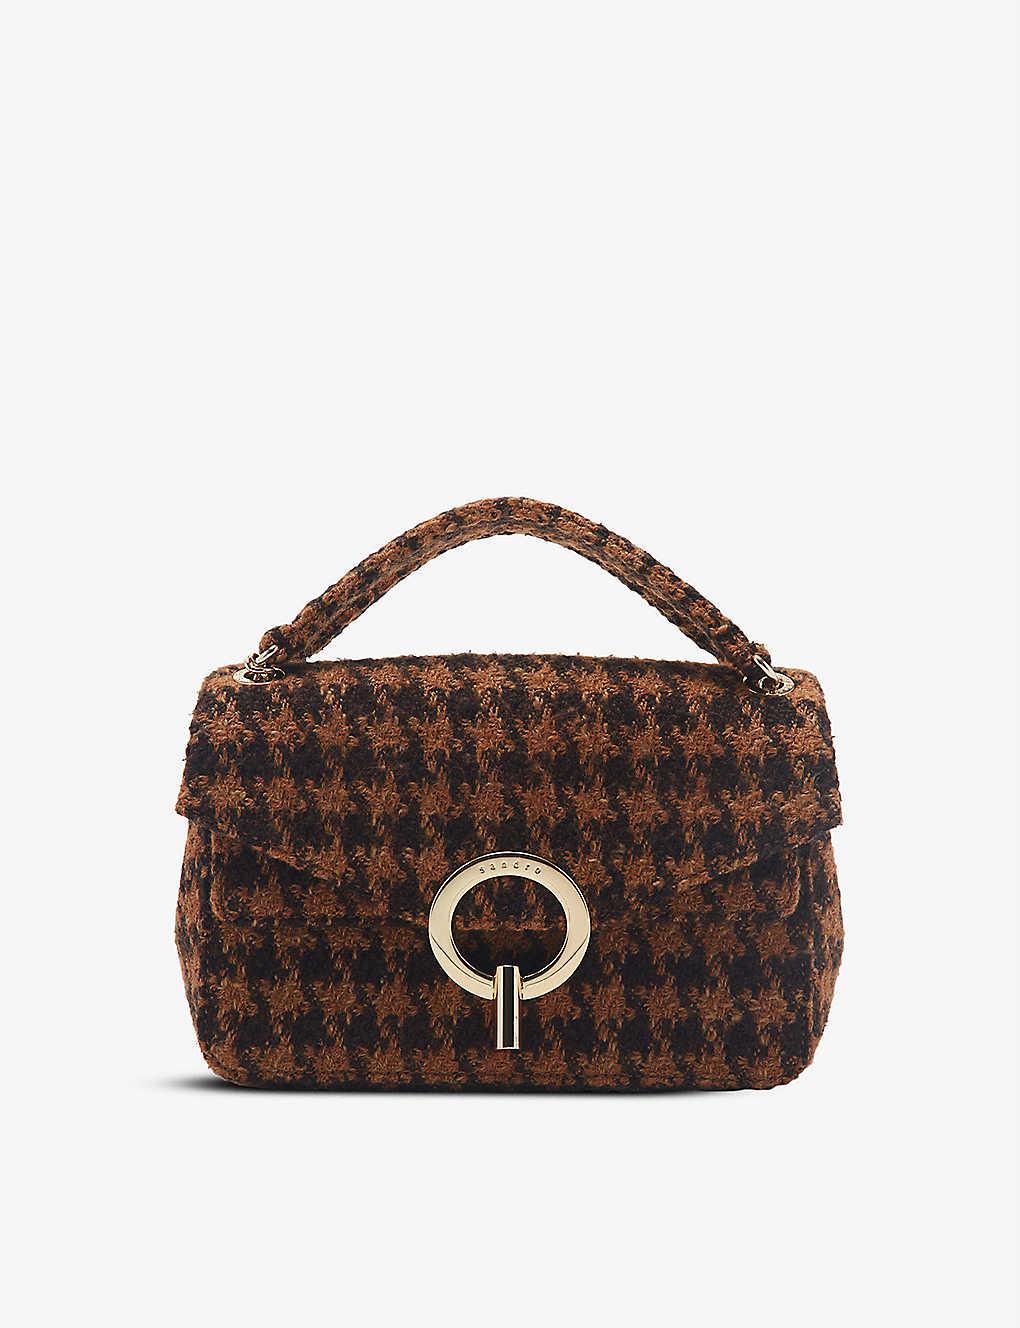 Sandro Houndstooth Knitted Shoulder Bag In Brown